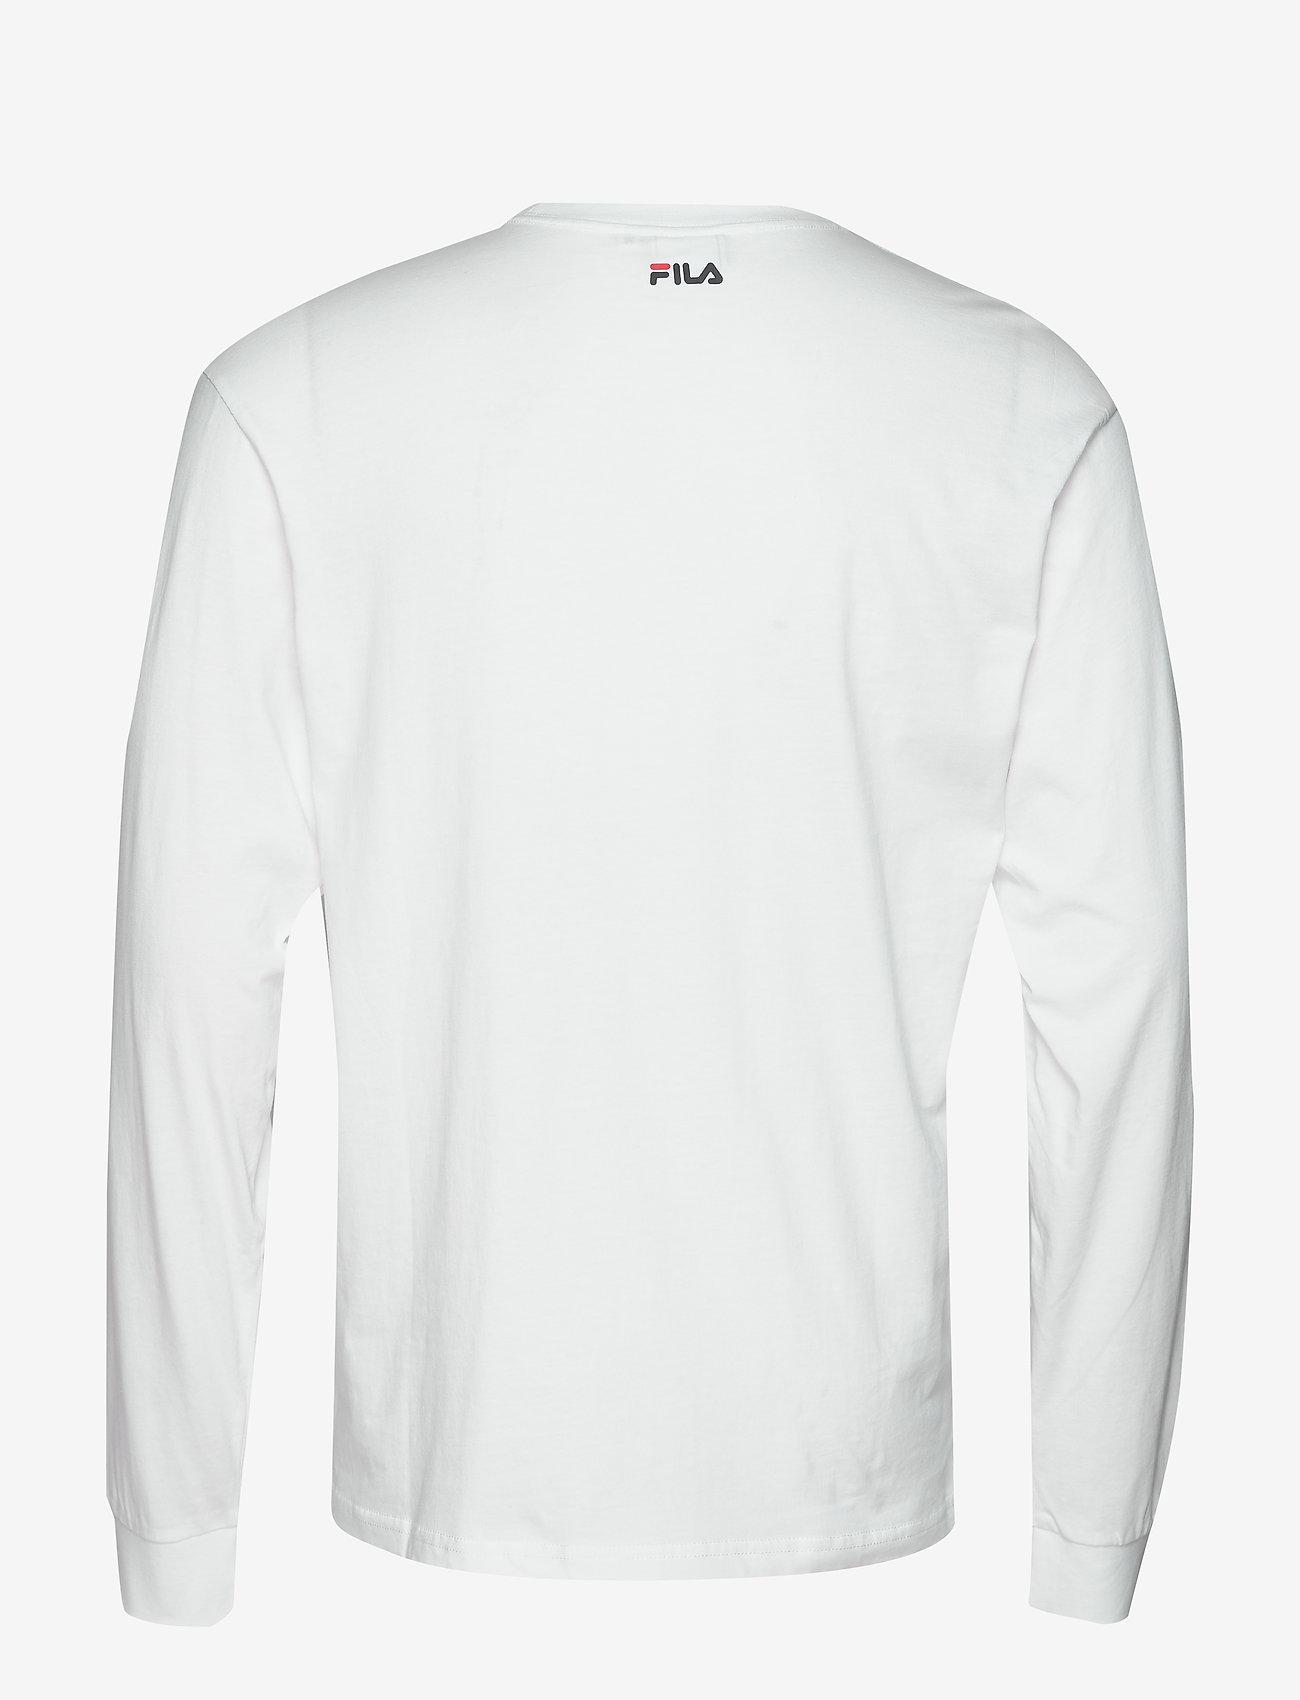 FILA - UNISEX CLASSIC PURE long sleeve shirt - hauts à manches longues - bright white - 1